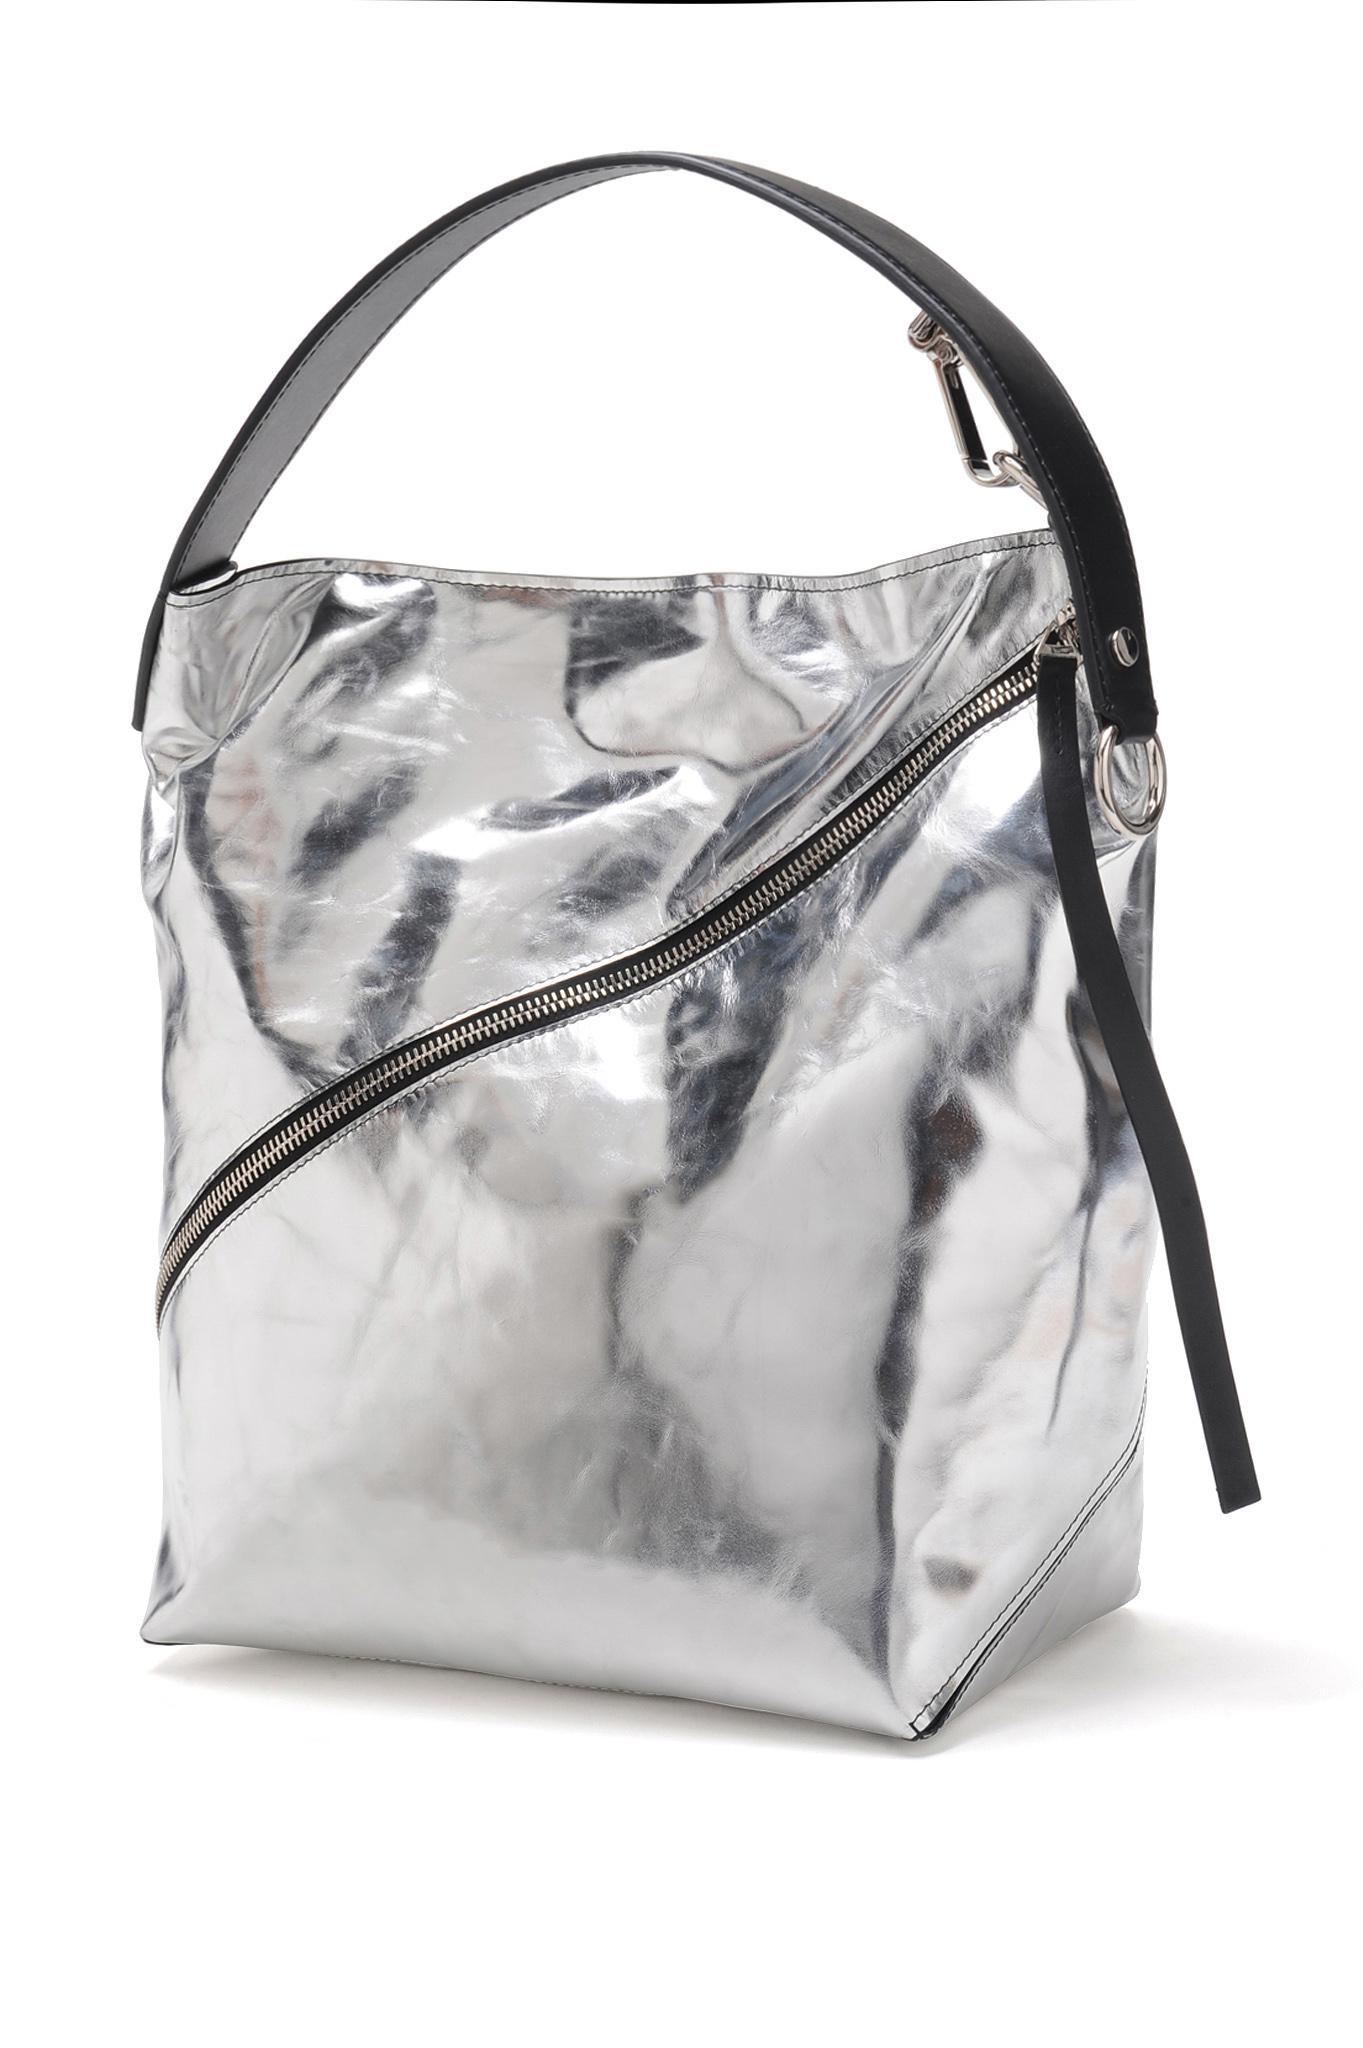 Proenza Schouler - Medium Soft Metallic Hobo Bag - Lyst. View fullscreen 4d7cb3cfd3567